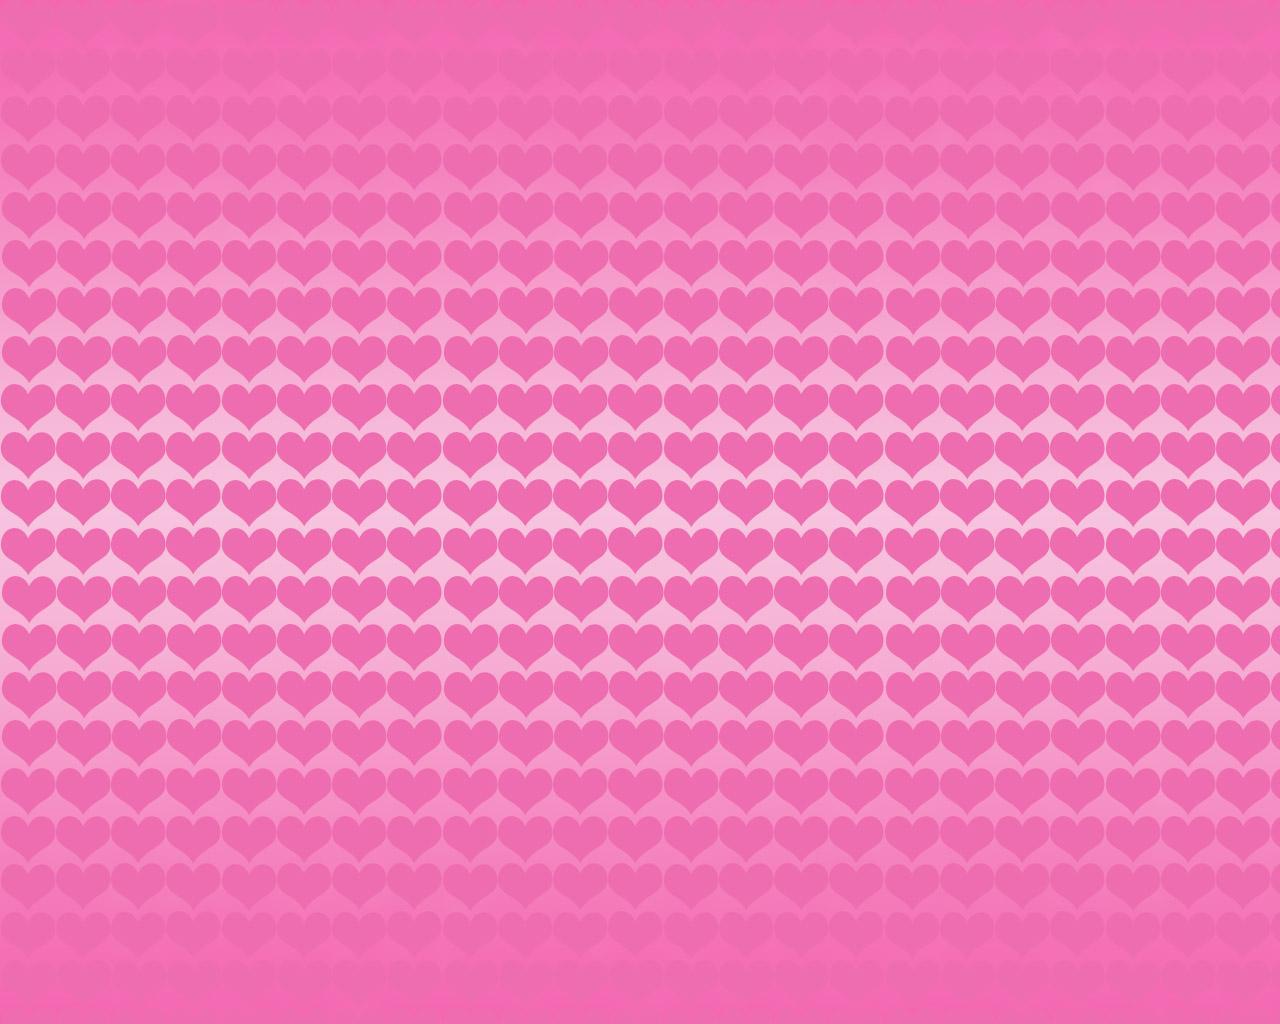 hp wallpaper pink - photo #19